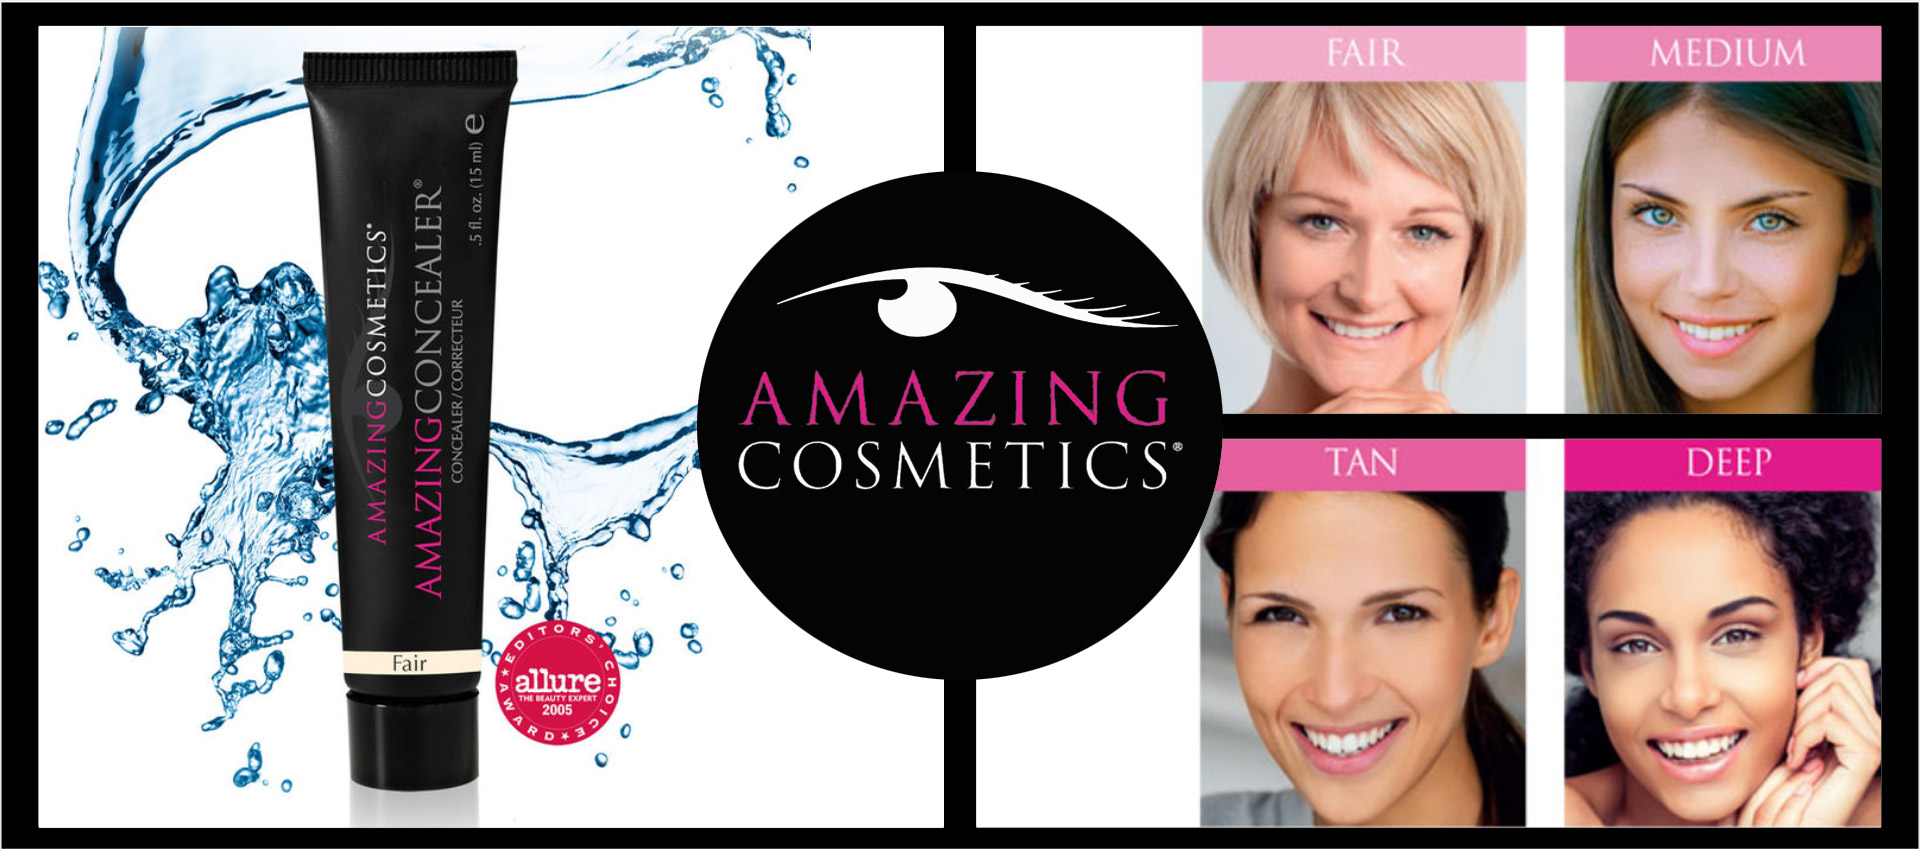 amazinc-cosmetics.jpg